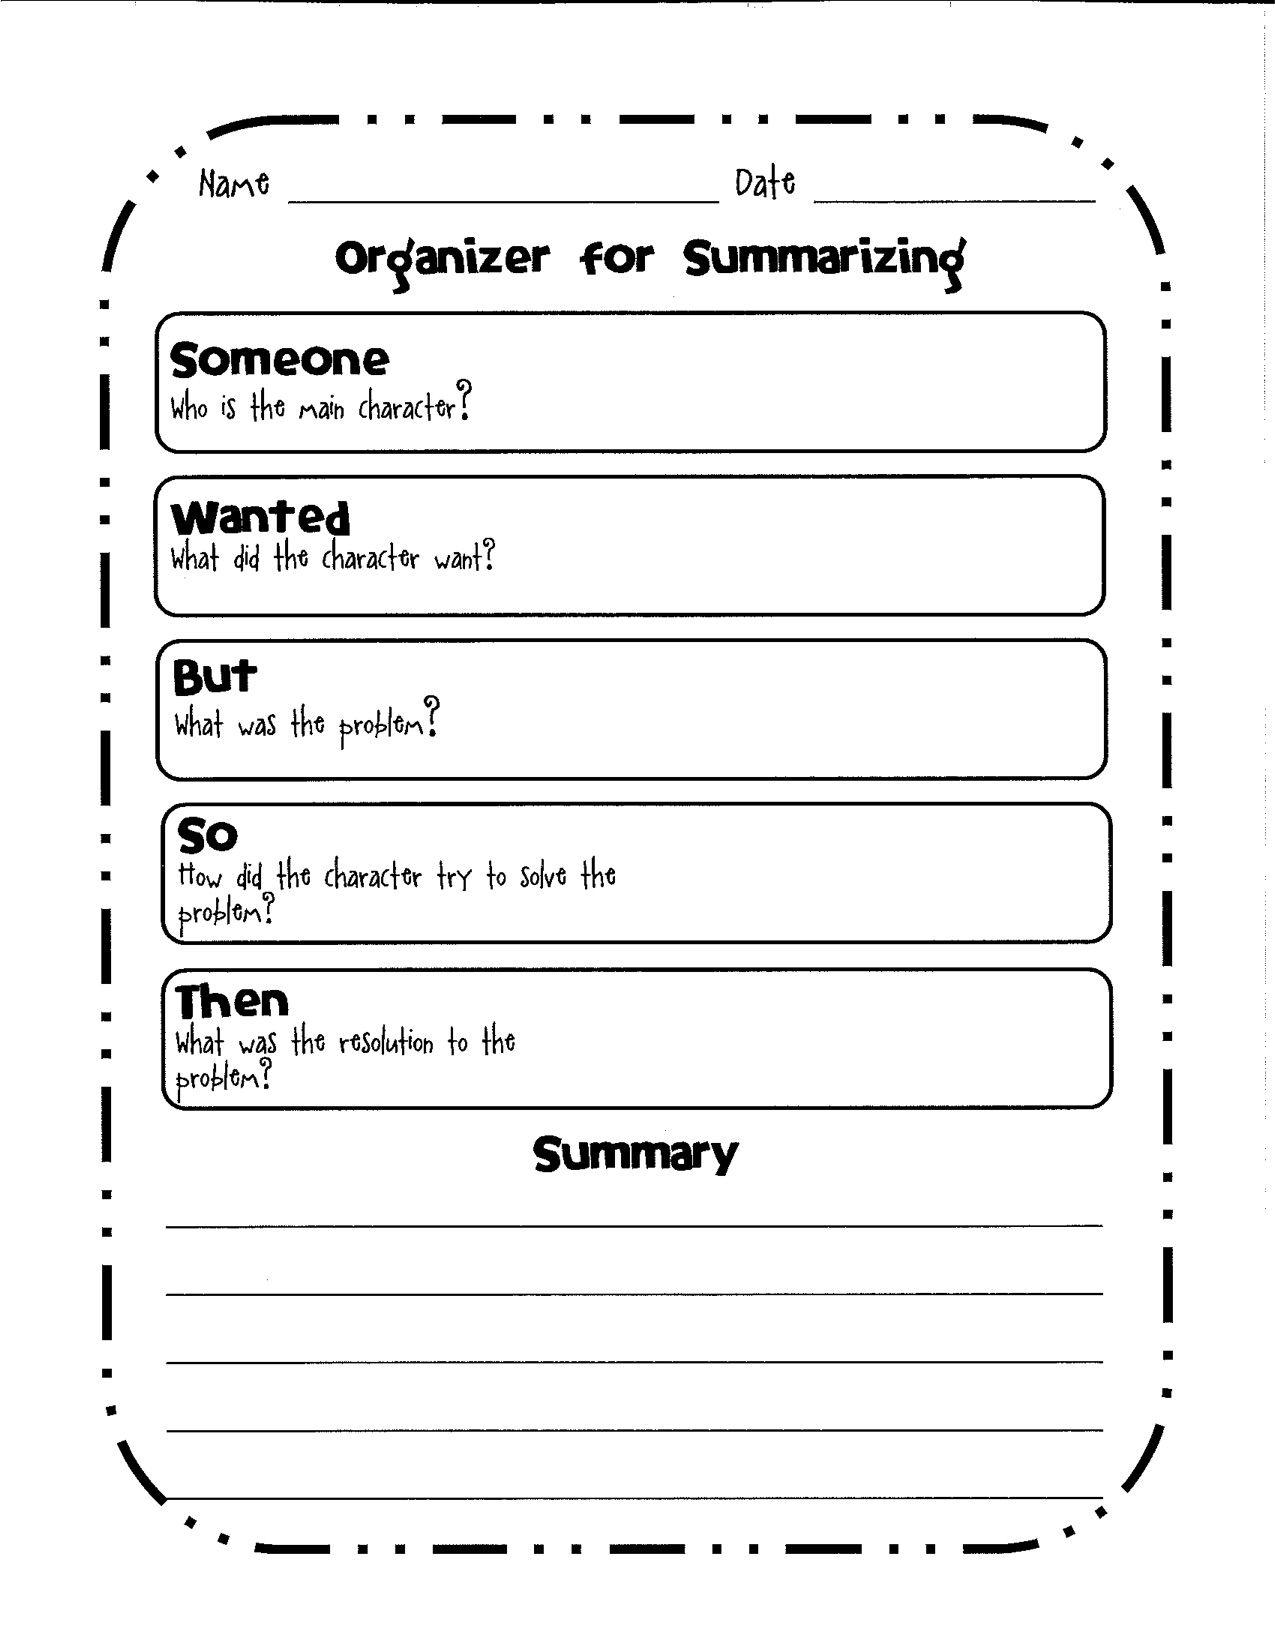 Organizer For Summarizing A Graphic Organizer To Help